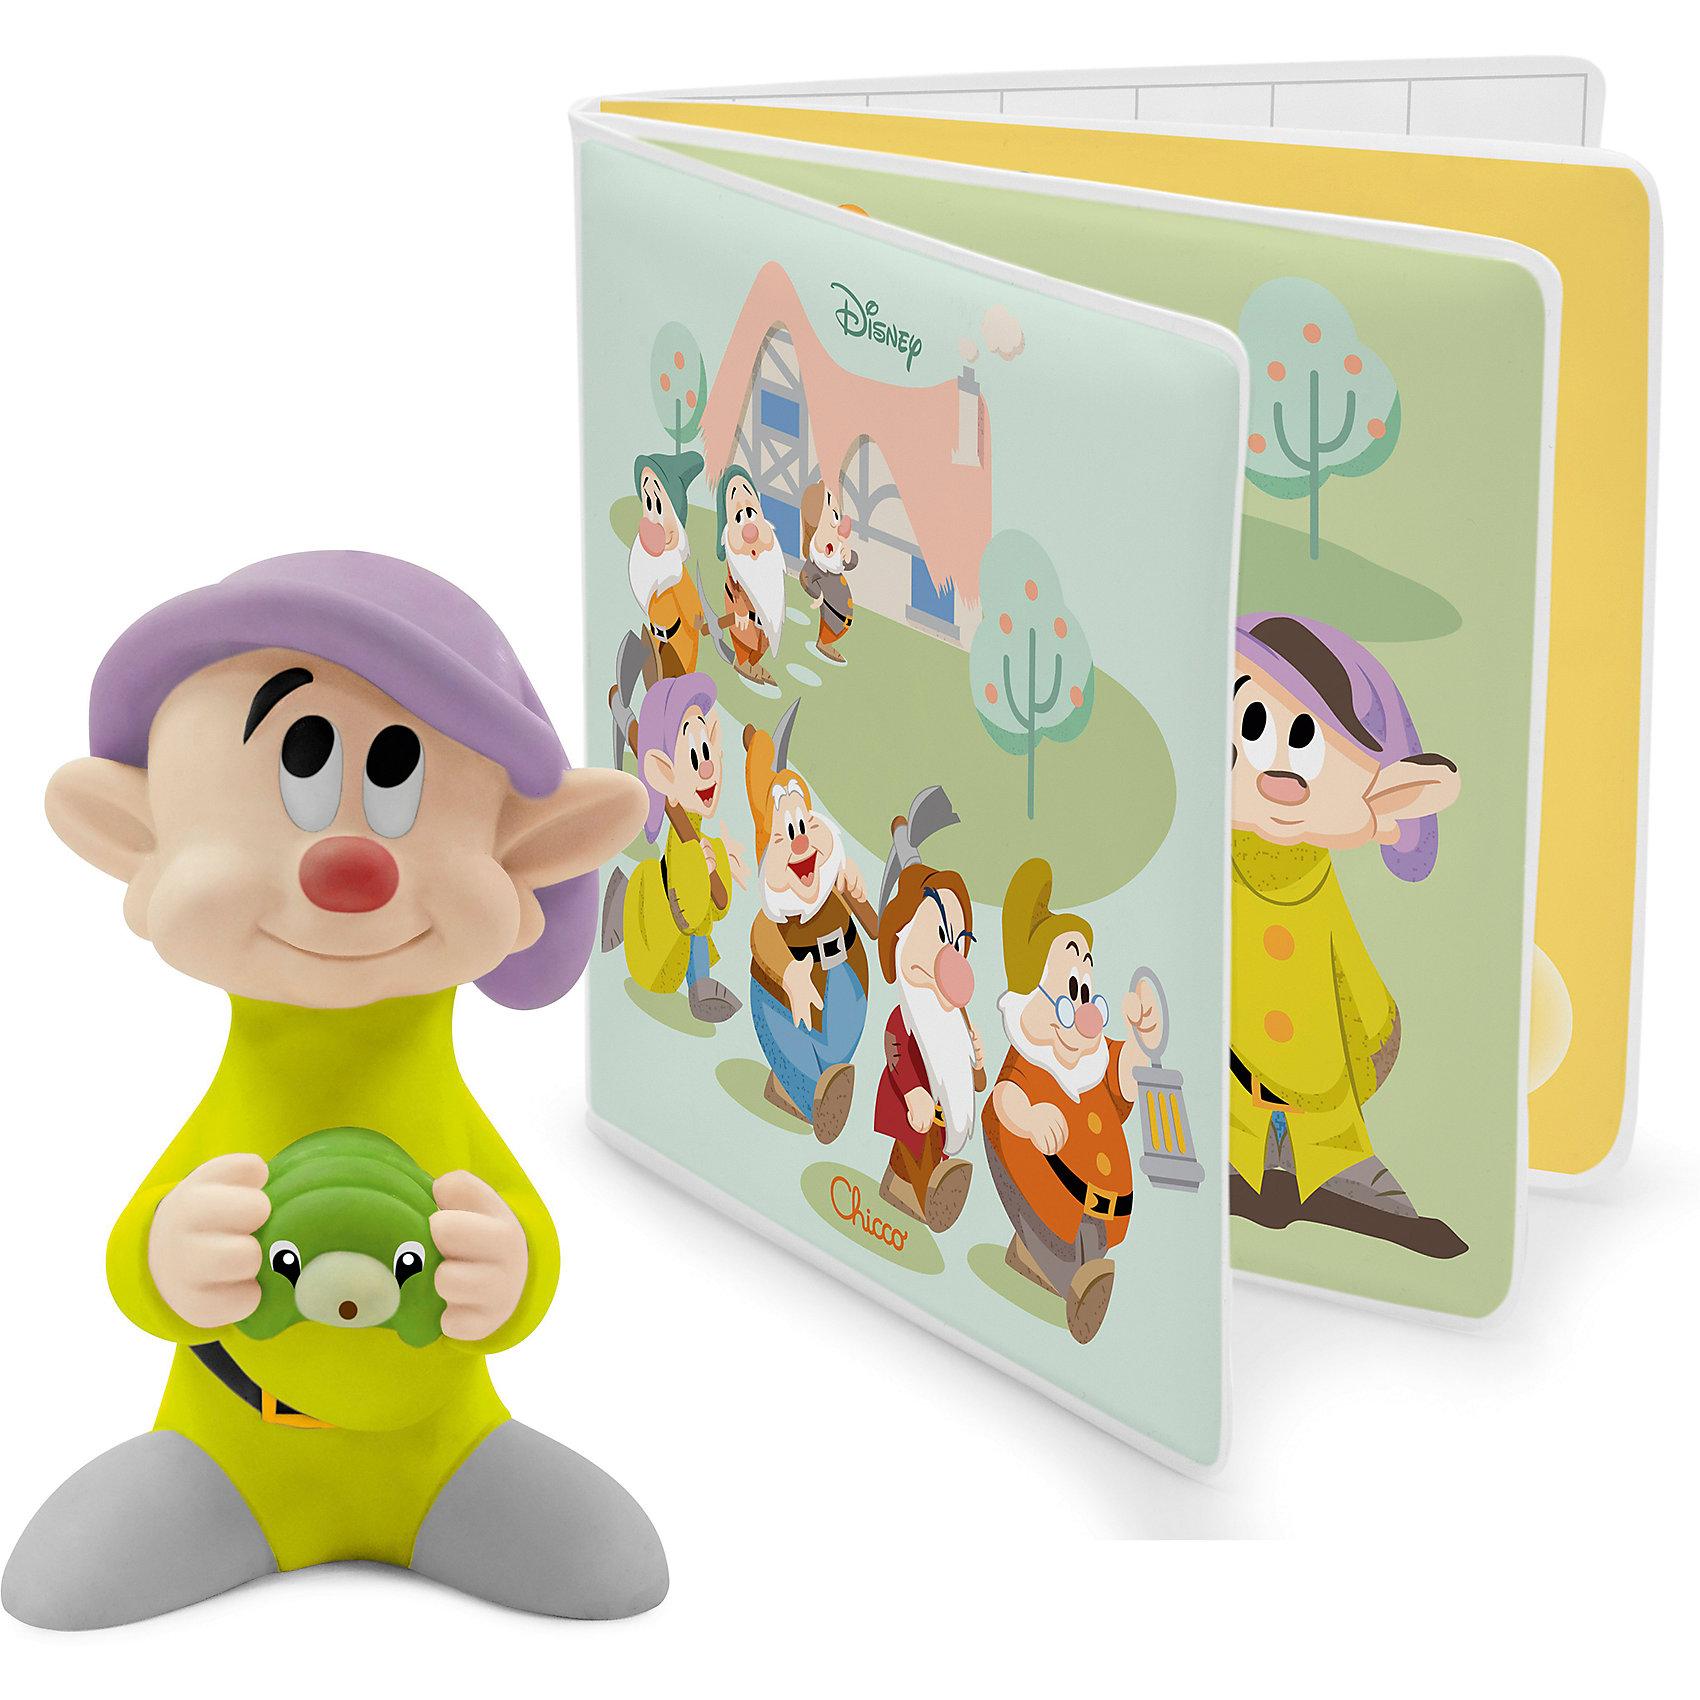 CHICCO Книжка-игрушка для ванны 7 гномов, Chicco chicco chicco игрушка для ванны лейка с цветком